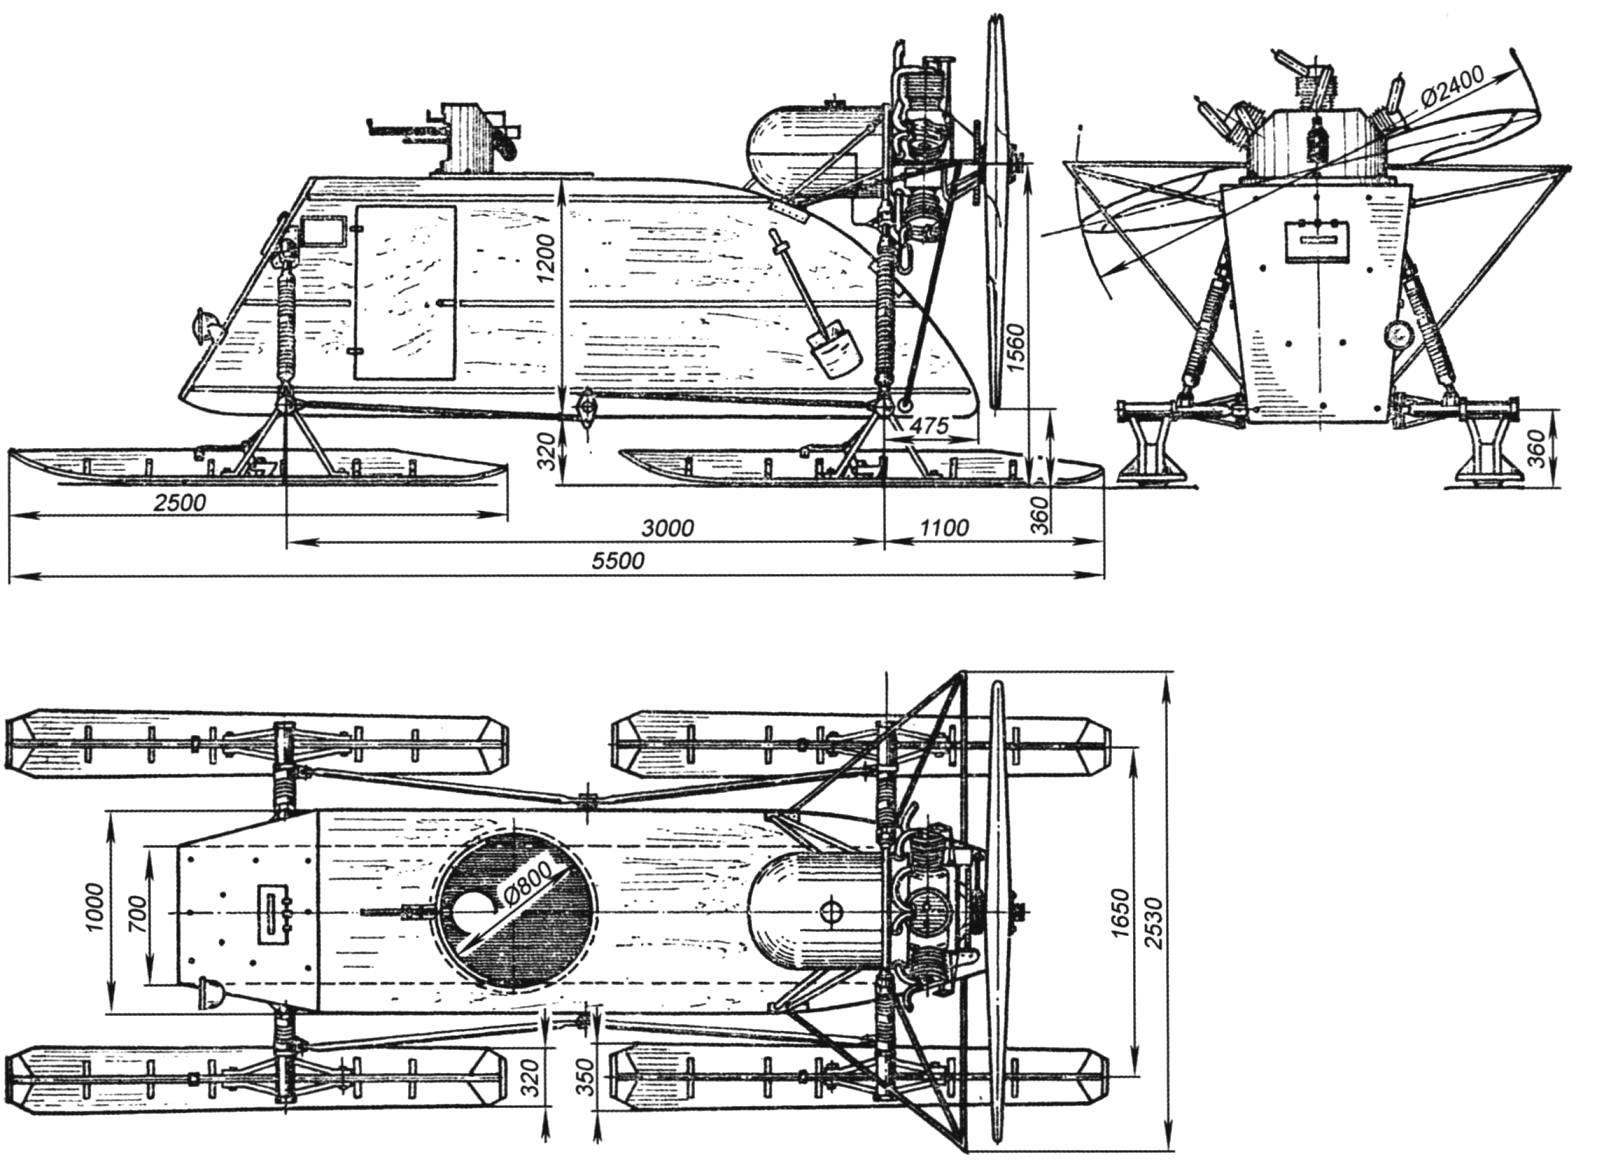 Аэросани НКЛ-26, габаритная схема